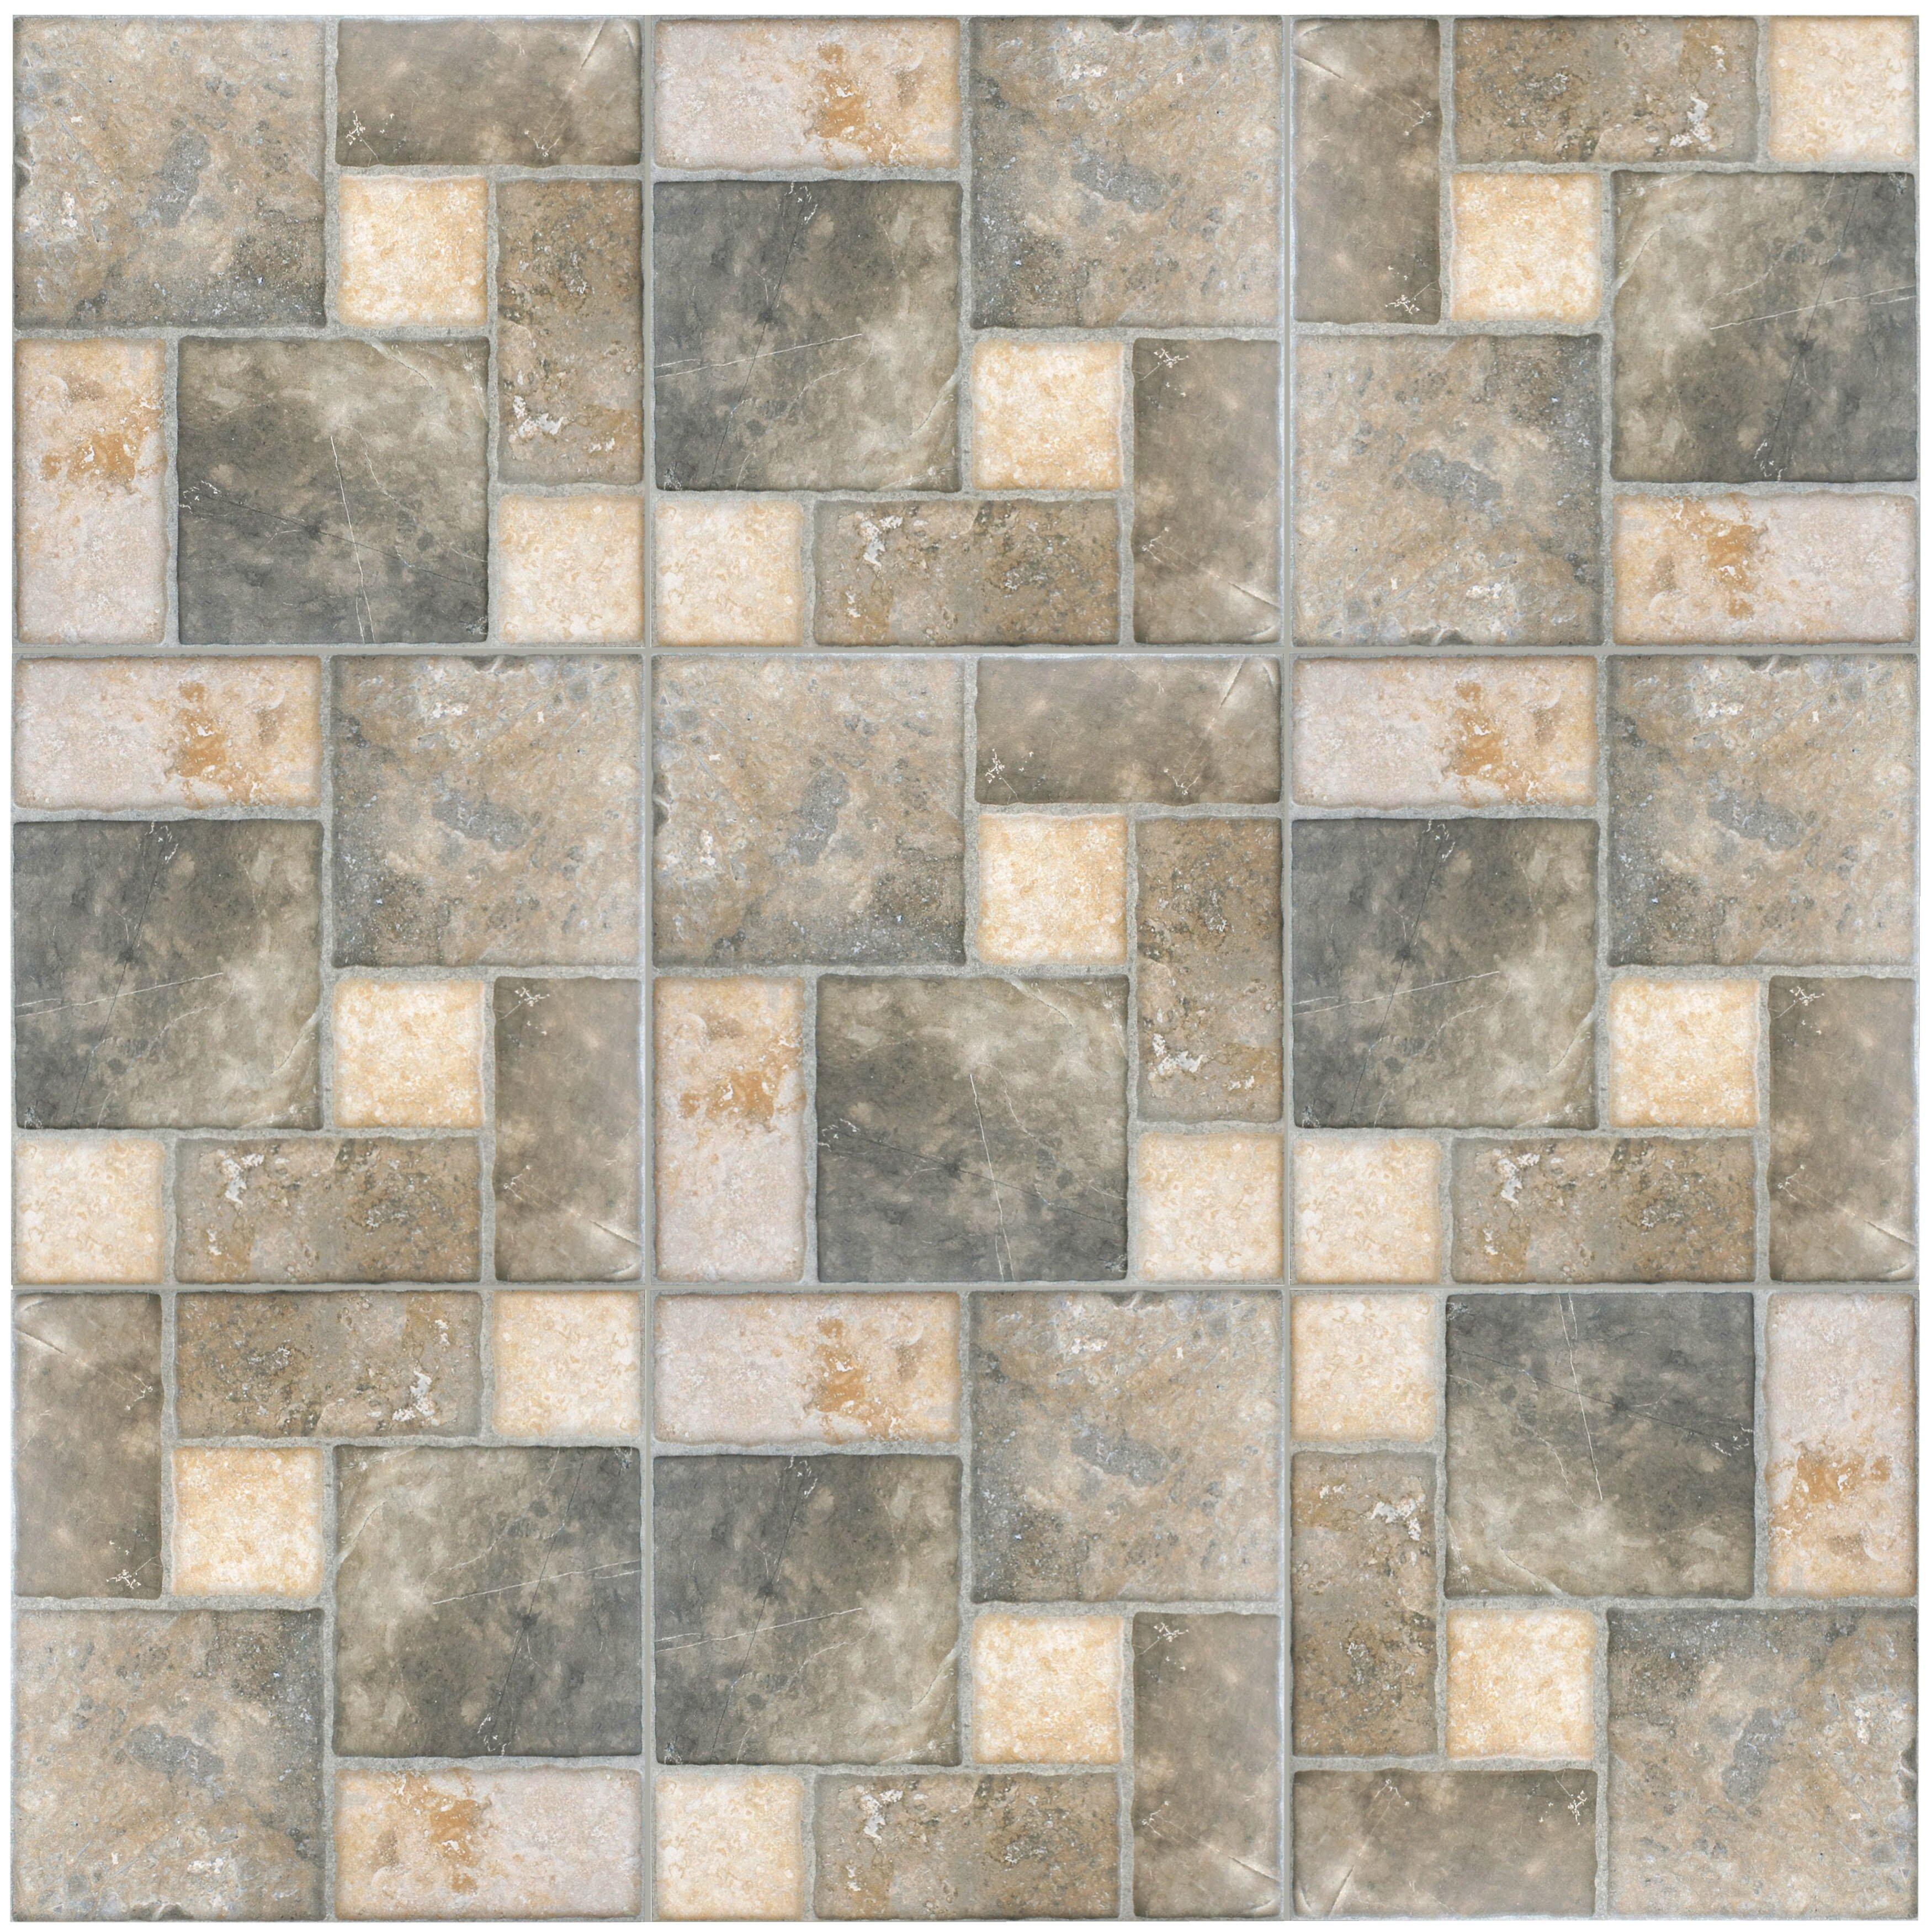 Elitetile Catalan 17 75 Quot X 17 75 Quot Ceramic Floor And Wall